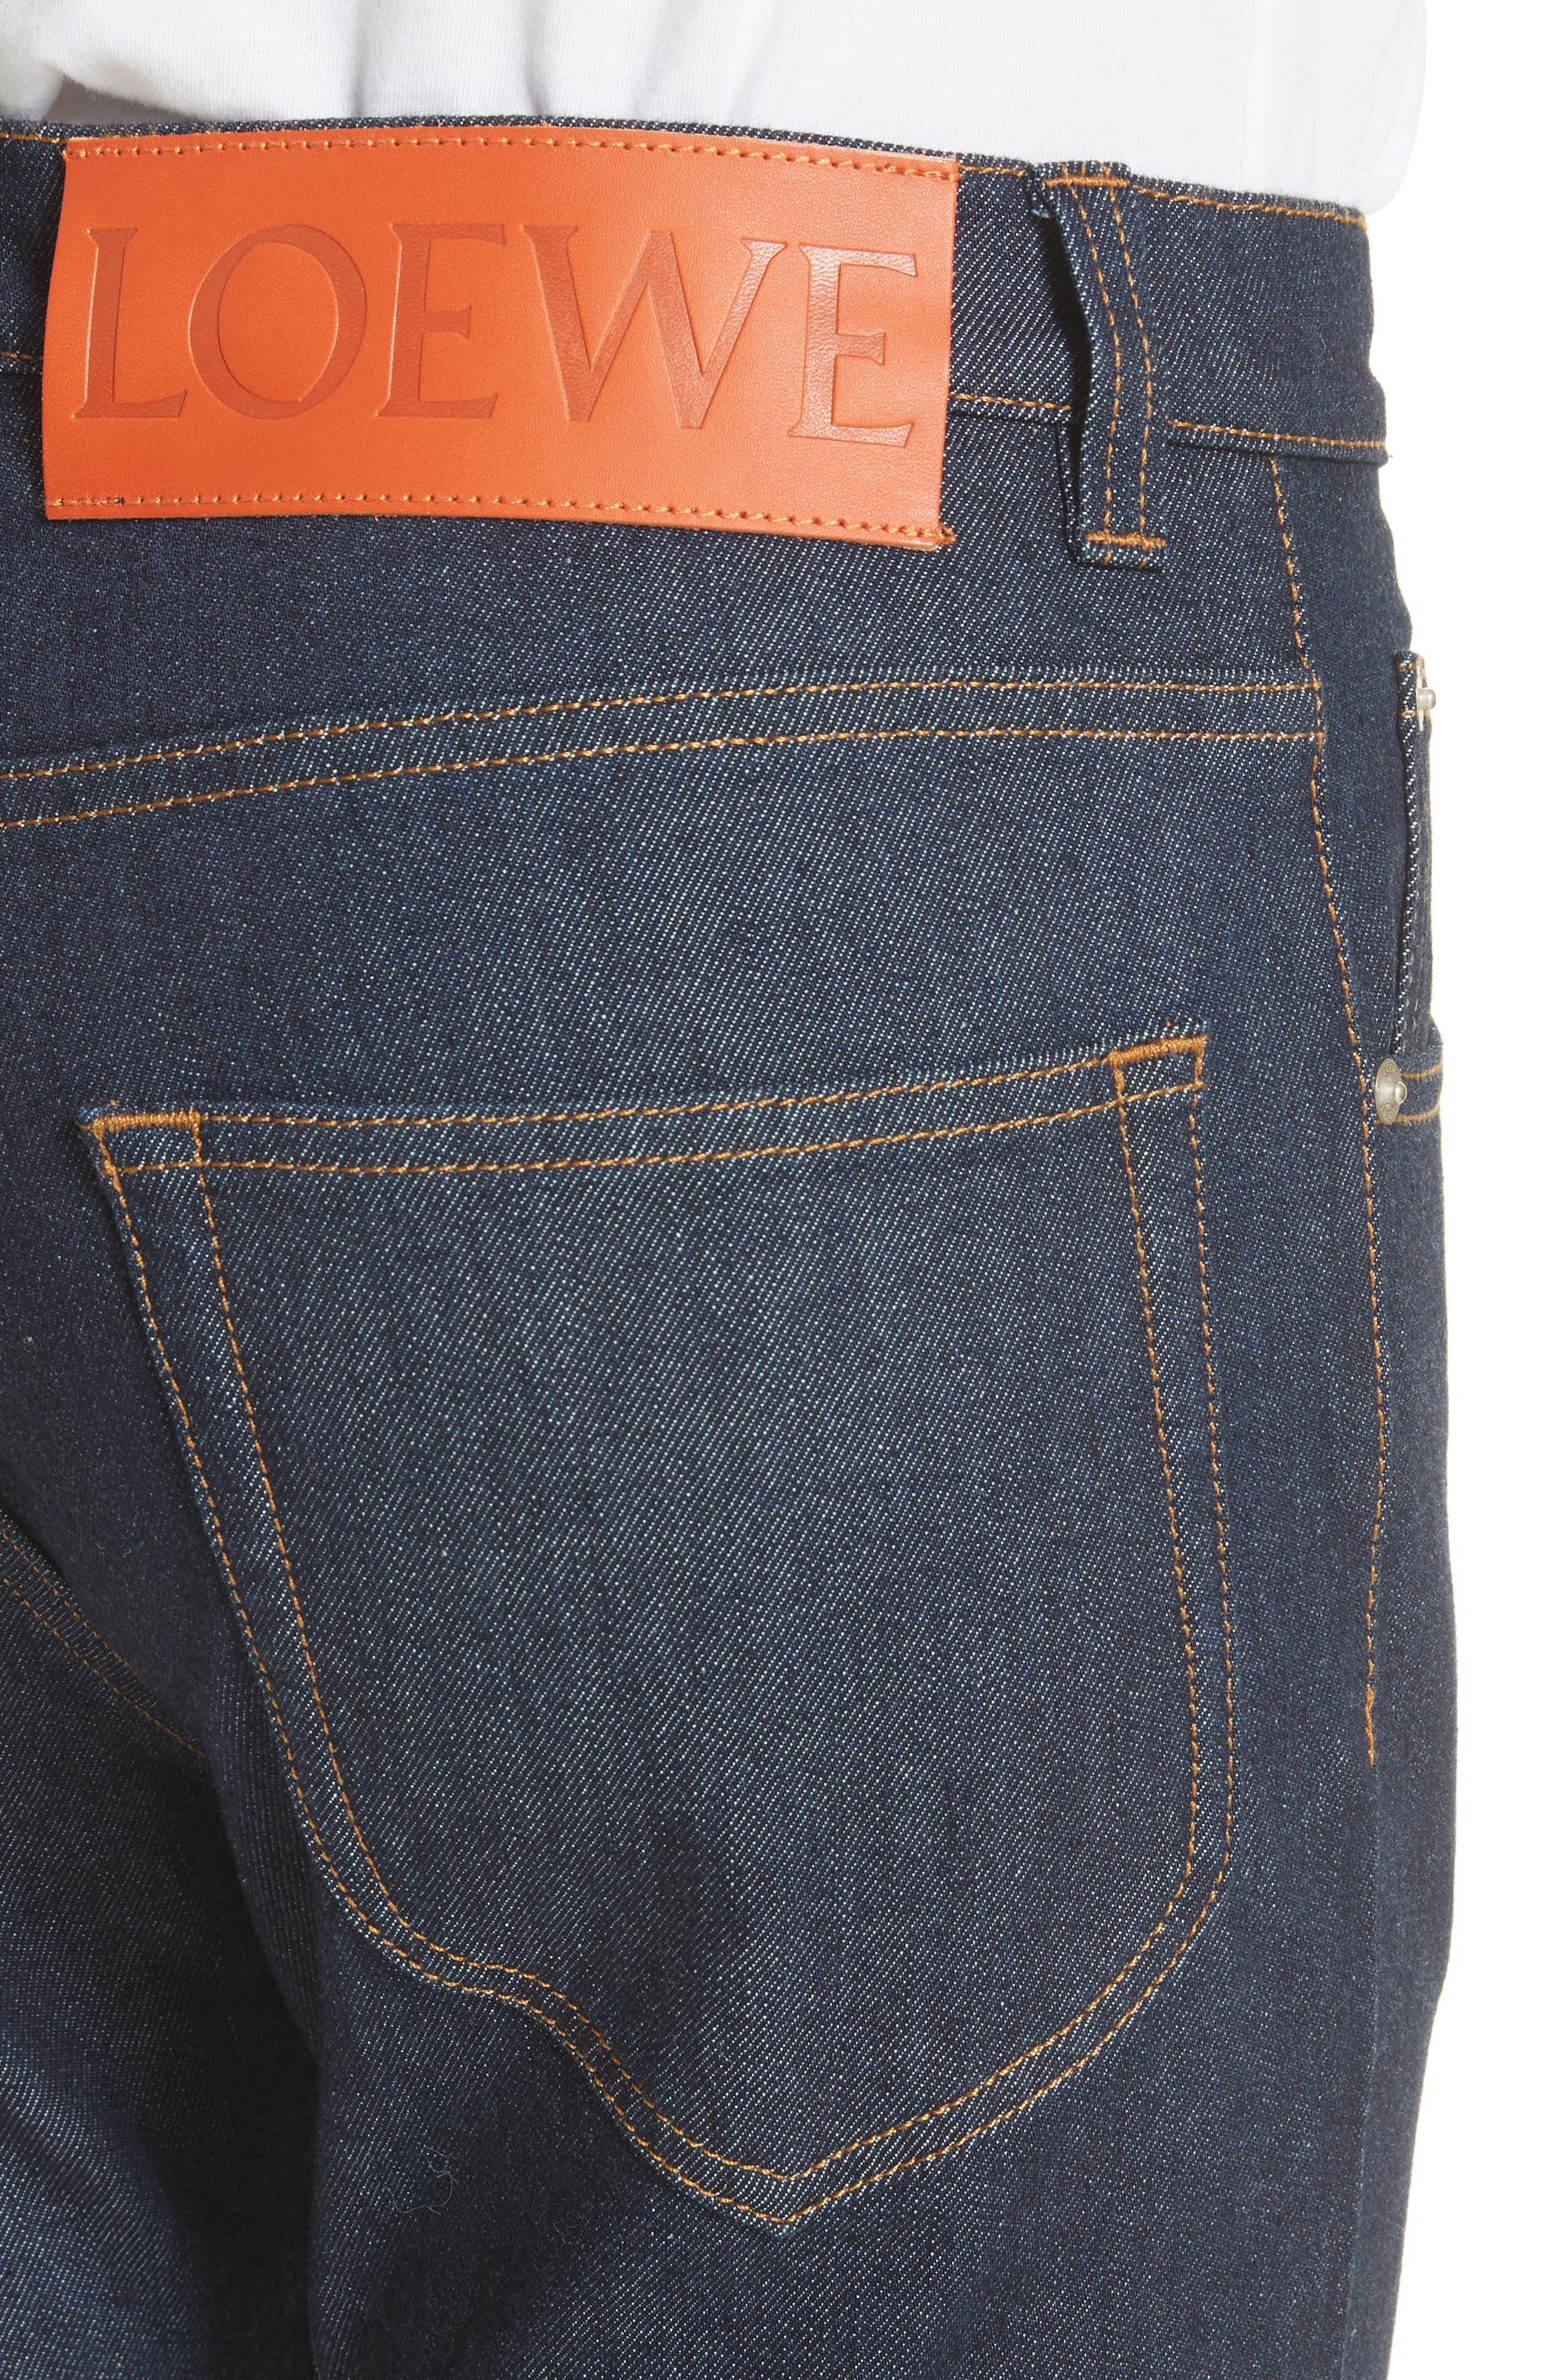 Skinny Fit Jeans,                             Alternate thumbnail 4, color,                             491